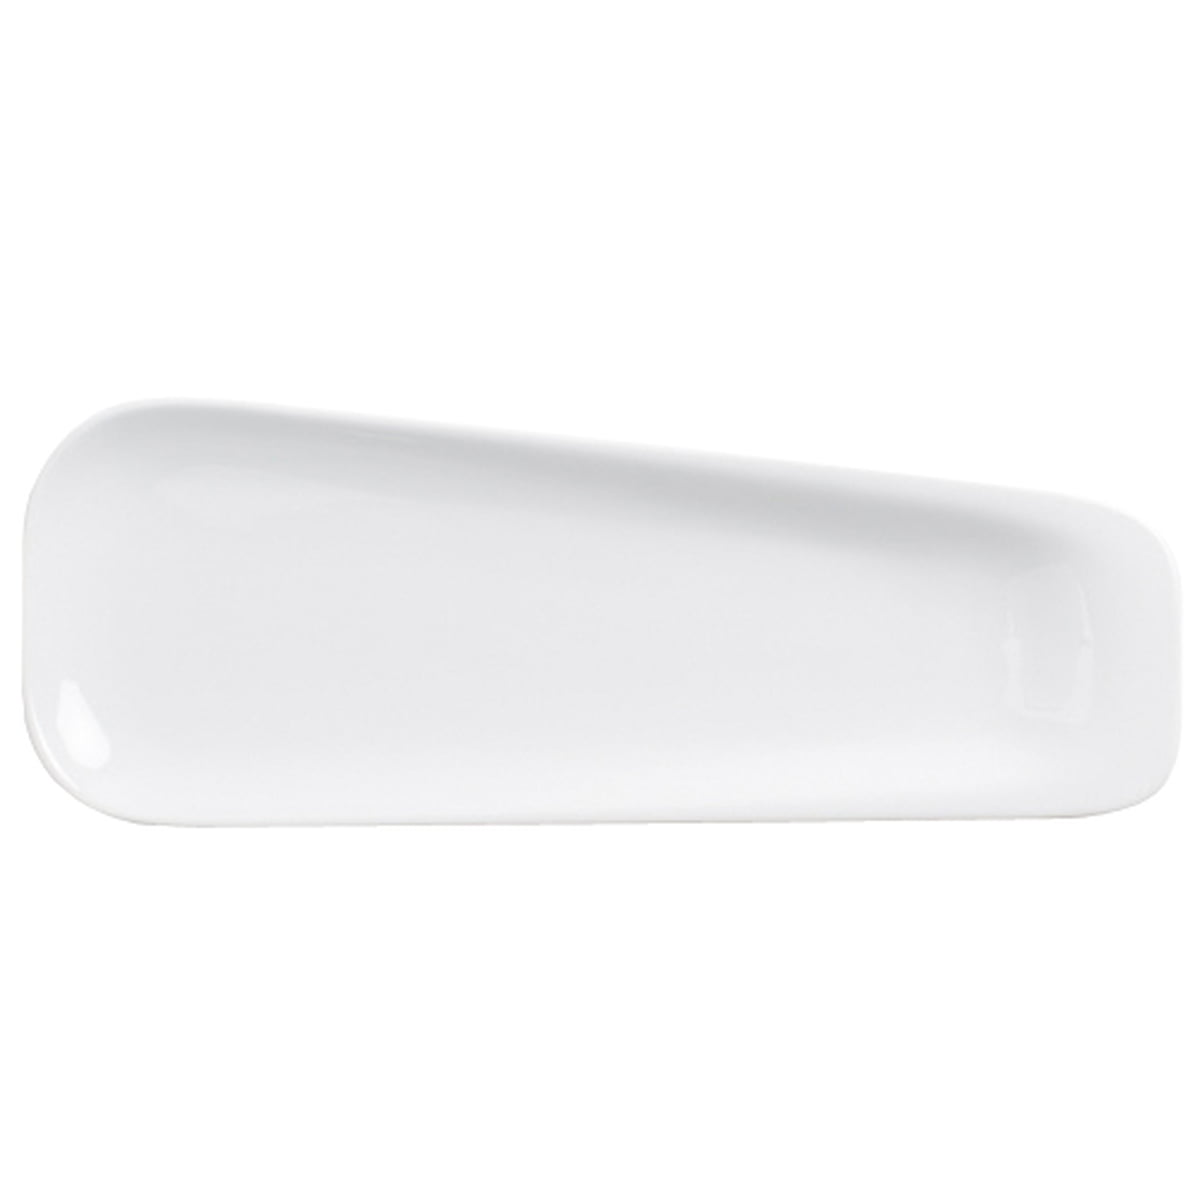 Elixyr, Platte, extralang, 40 cm, weiß